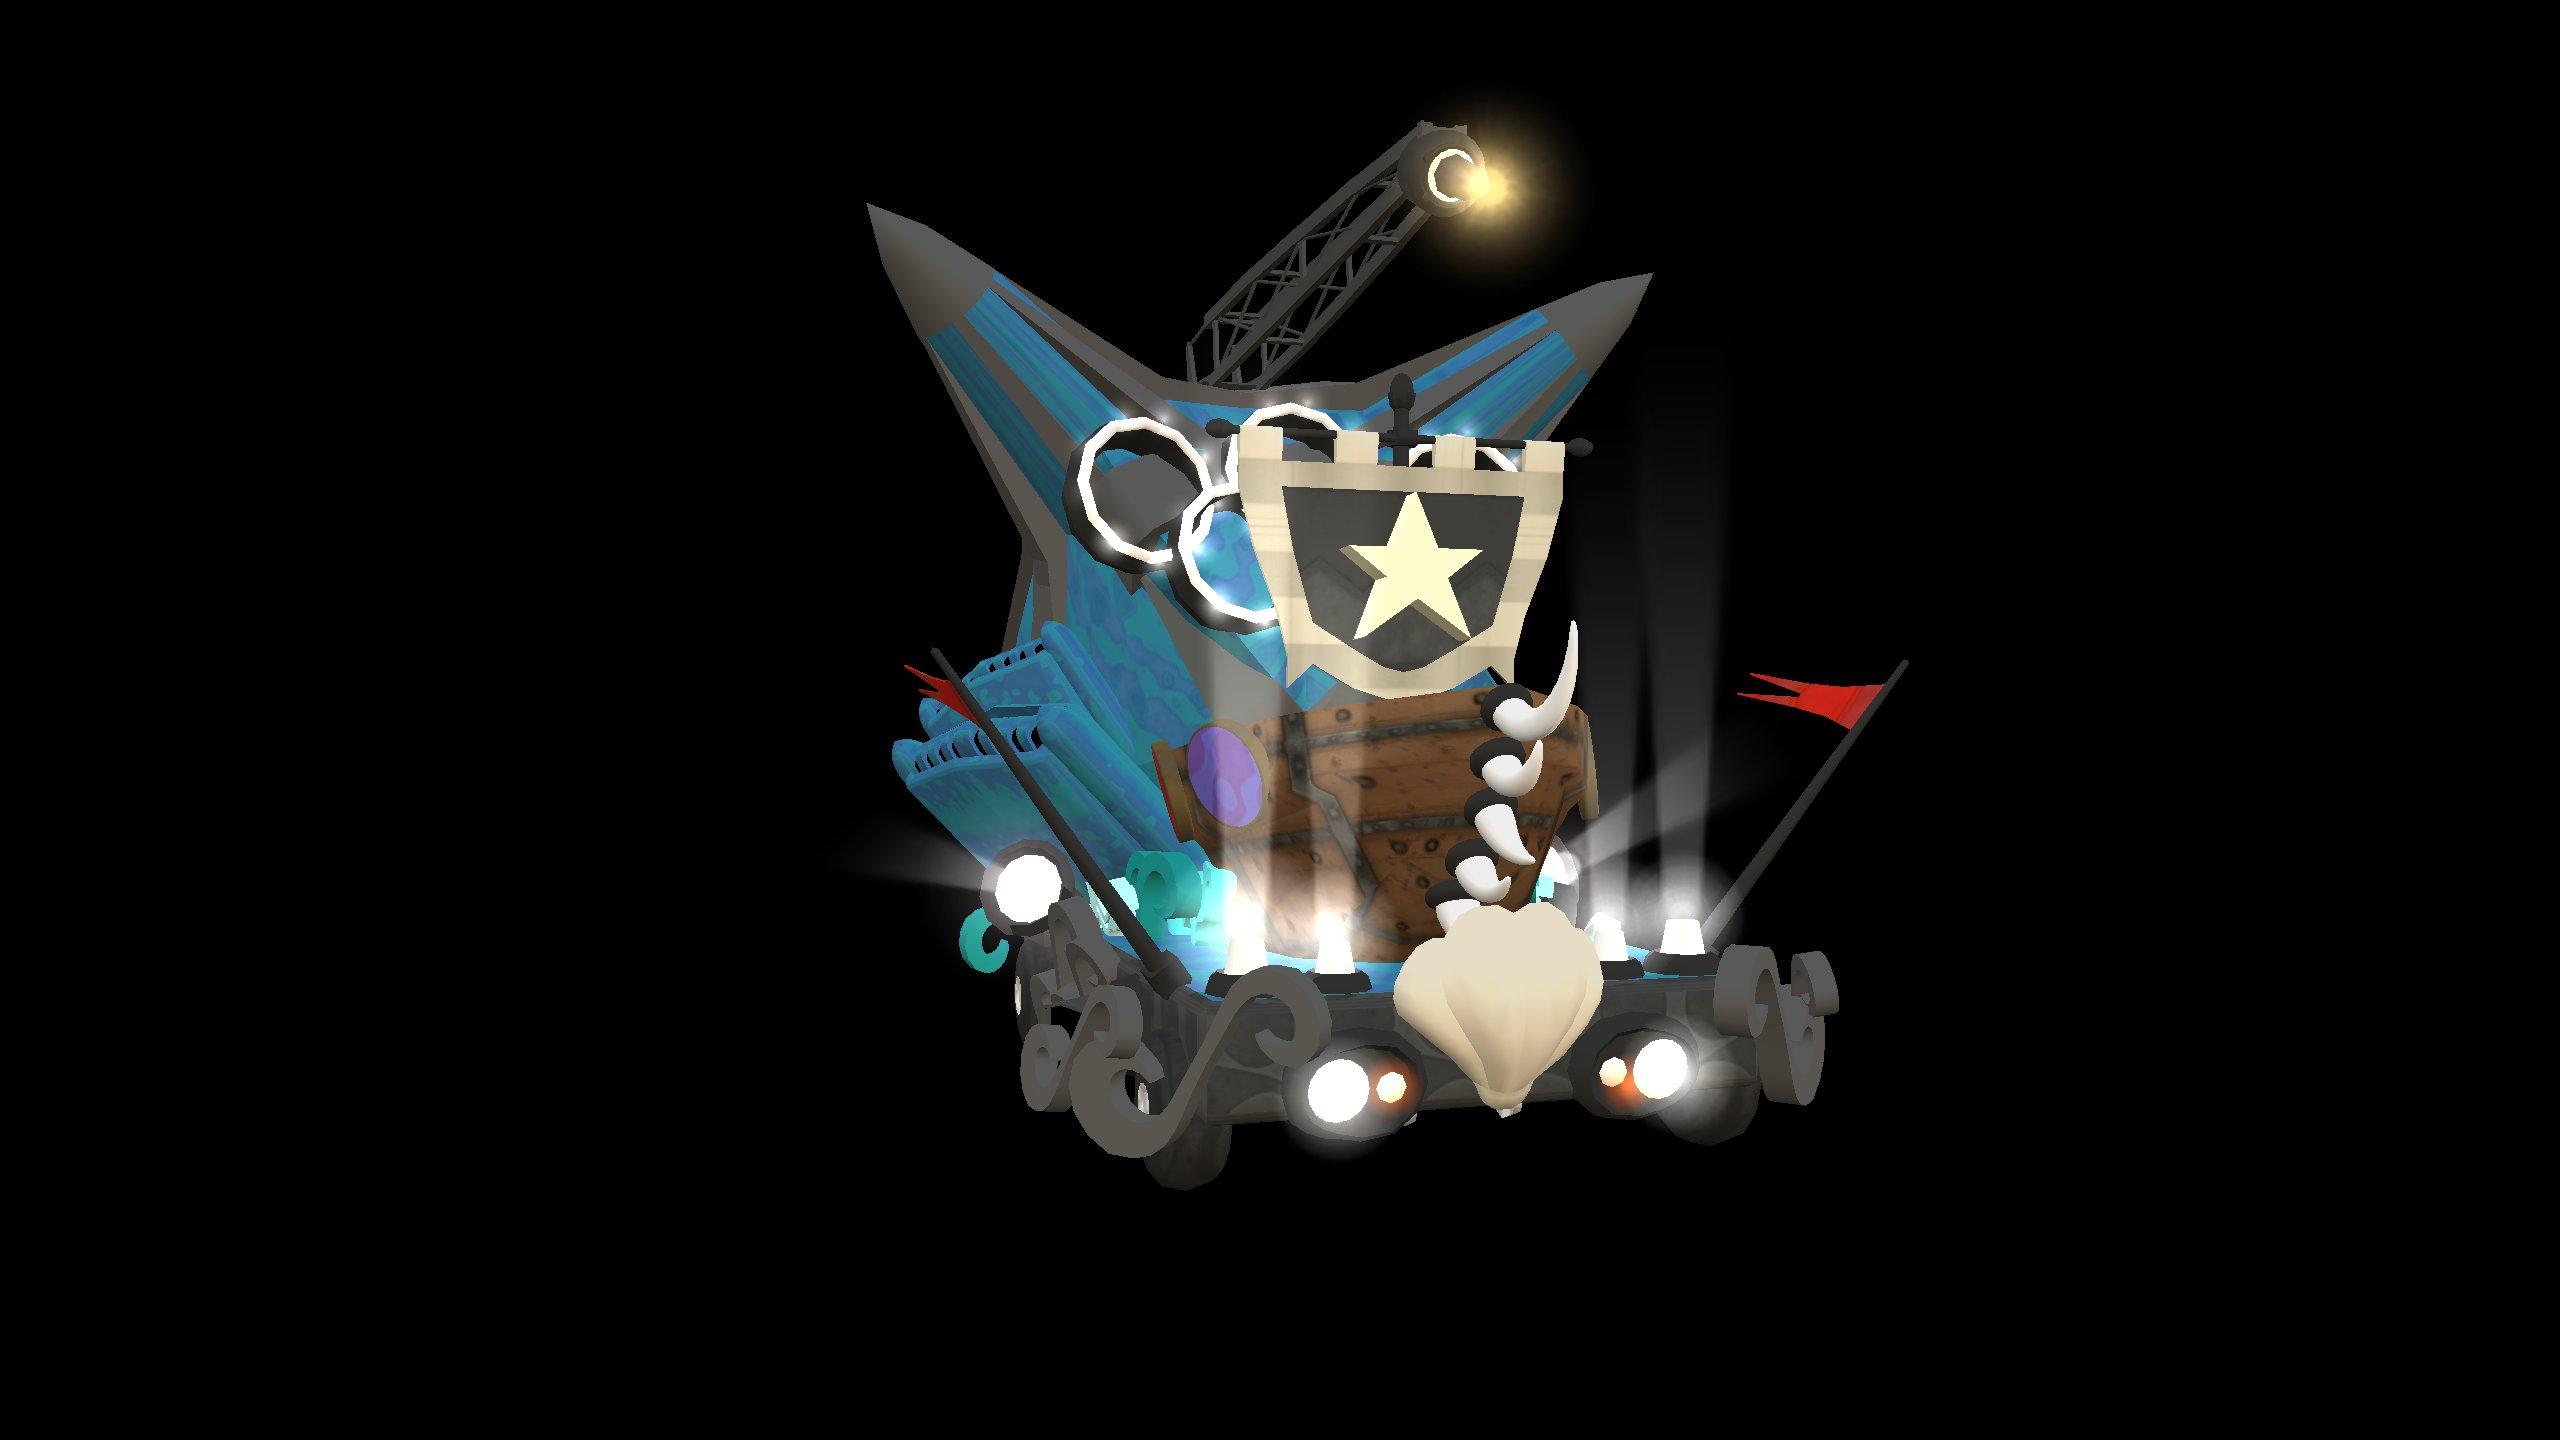 (37) Barco Pirata [O8][T] [♫] GZiegac